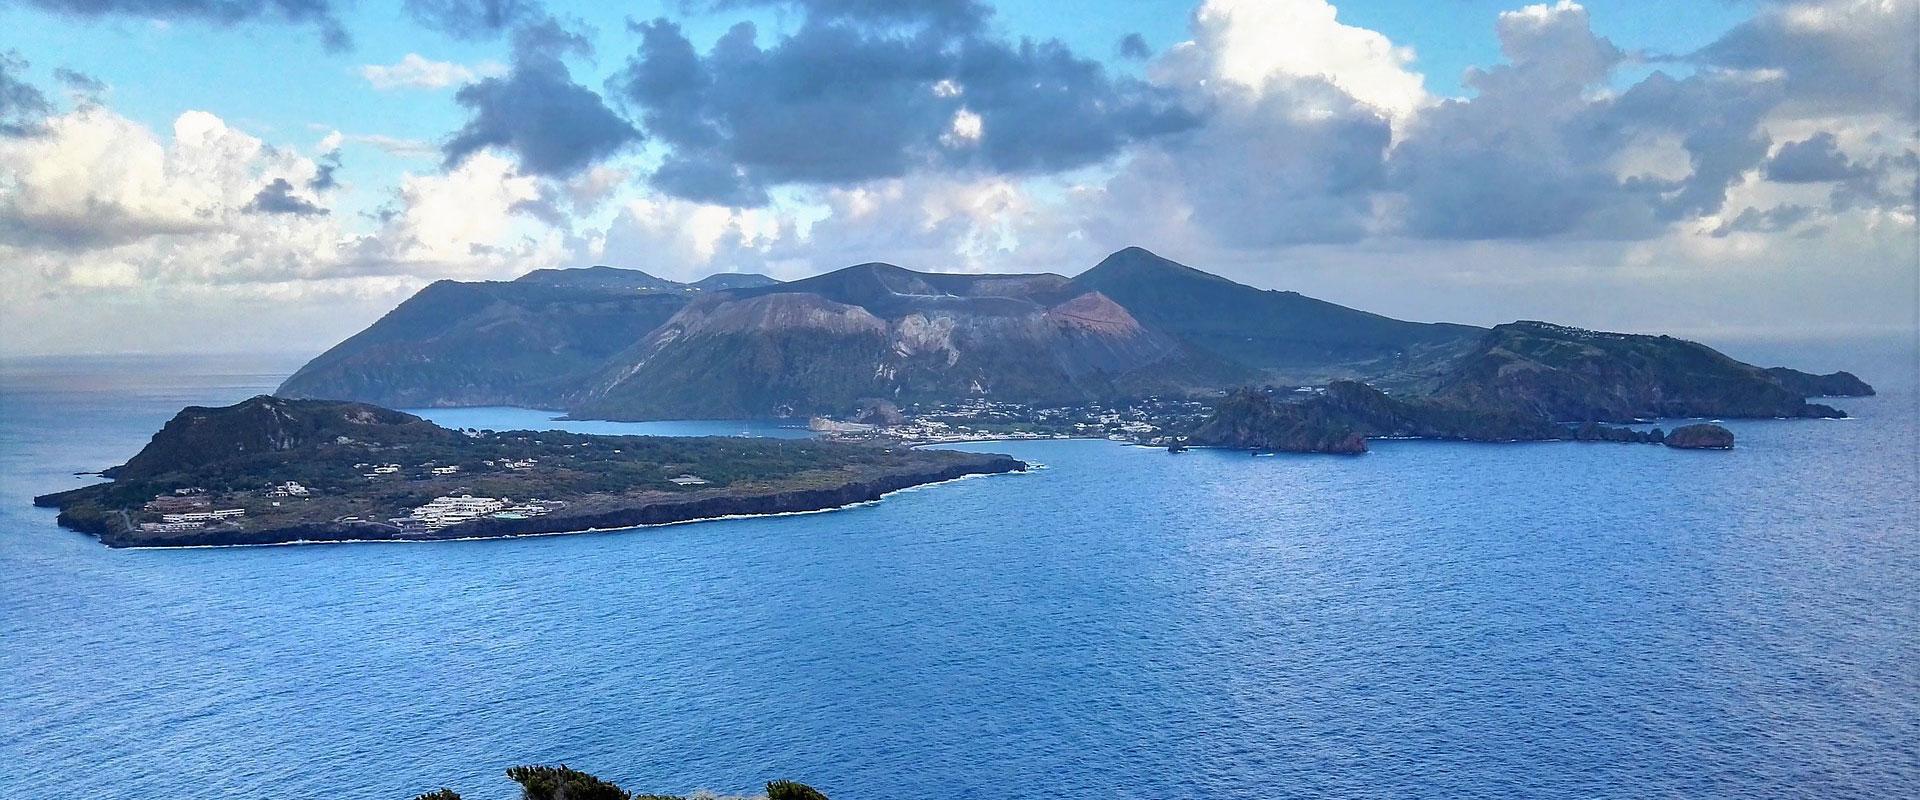 Vandring Pa Etna Og De Aeoliske Oer Selvguidet Vandreferie I Sicilien